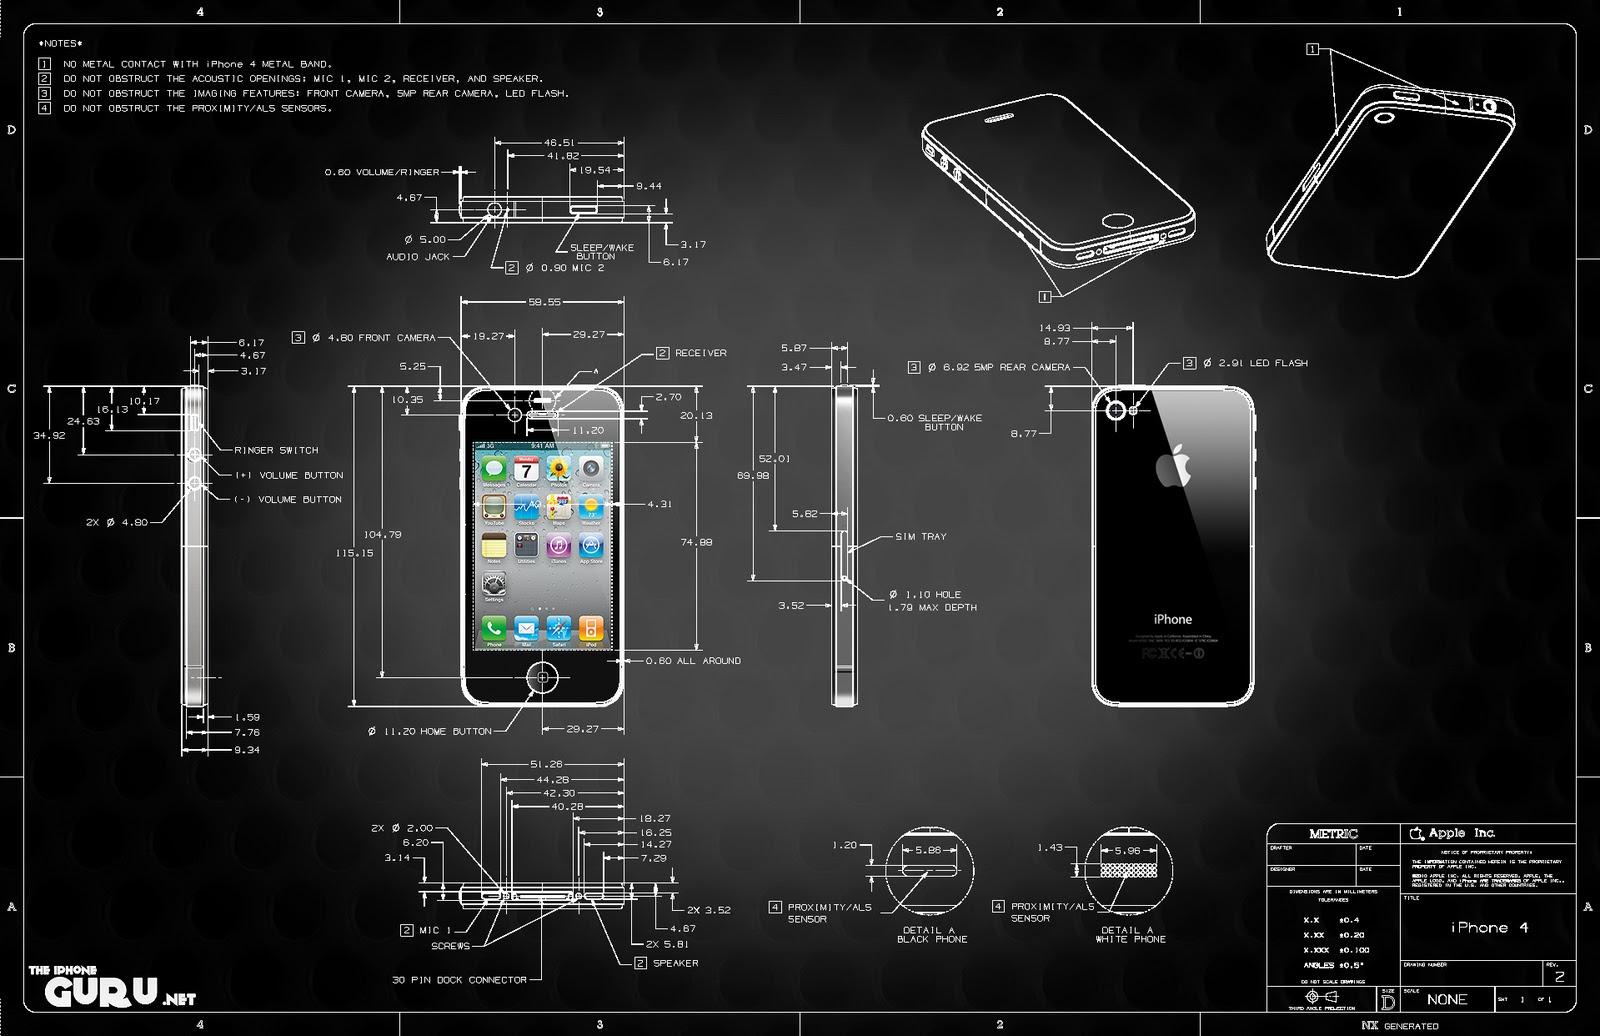 Hummer wallpaper para iphone imagenes for Wallpaper para iphone